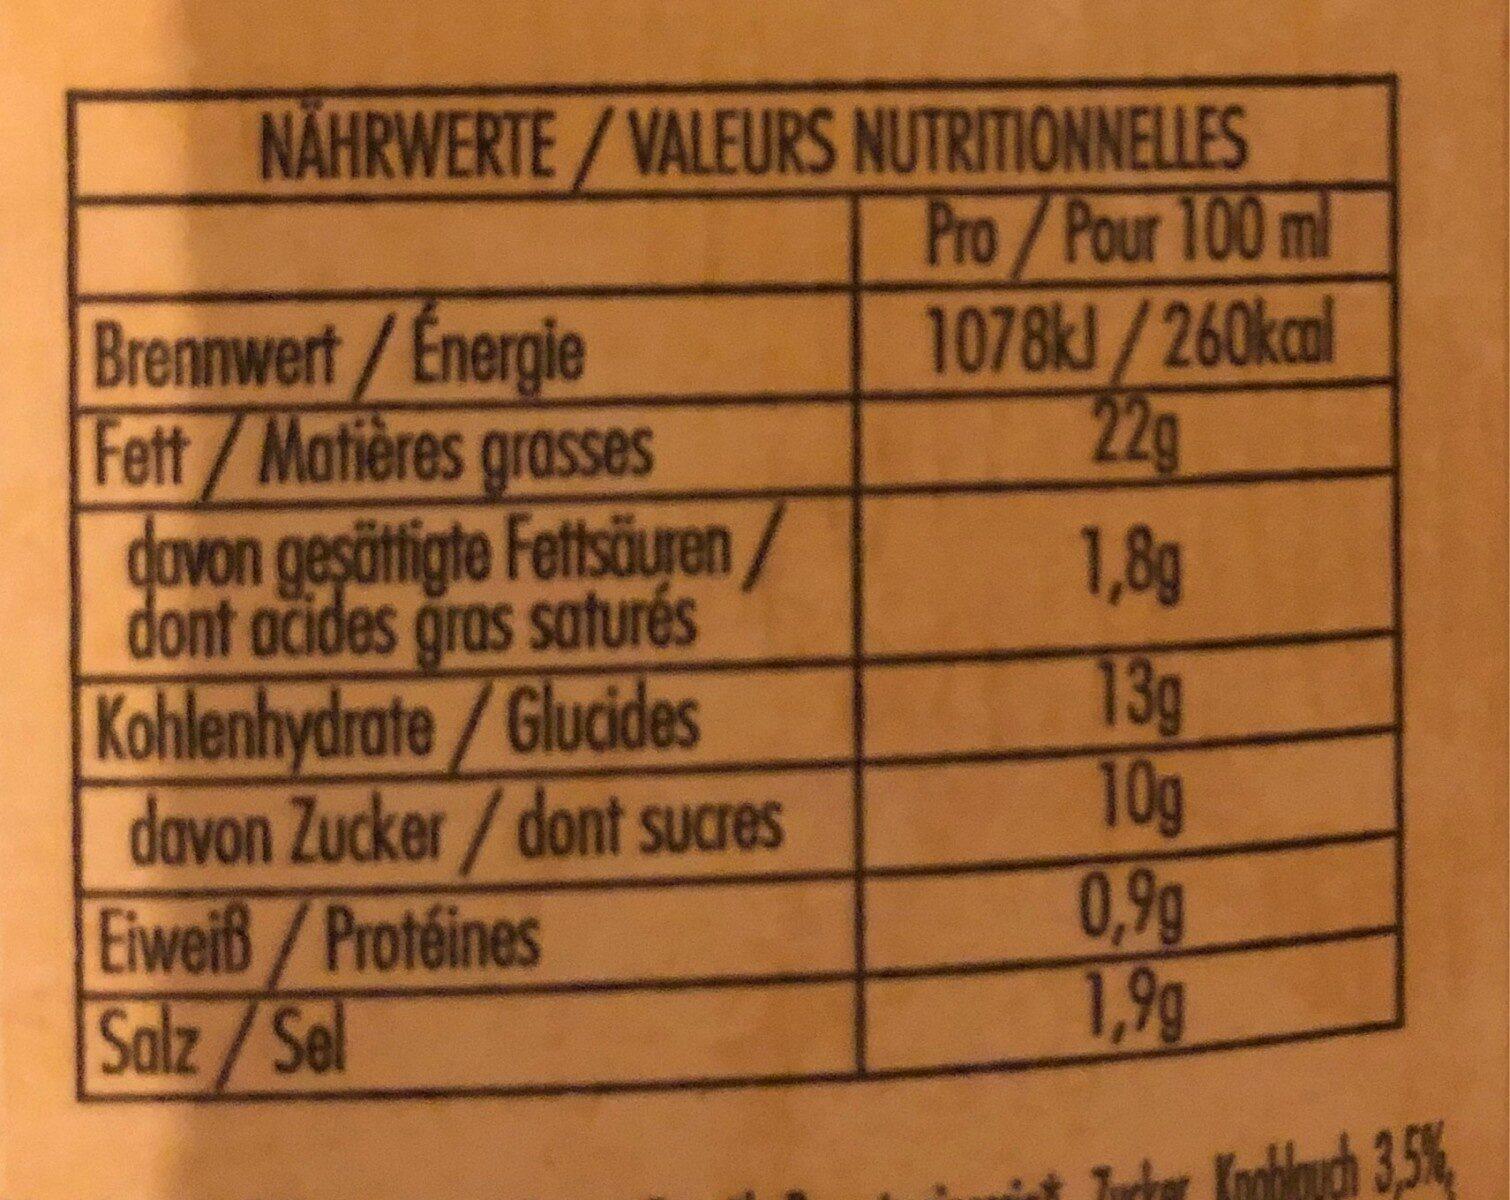 Bull's Eye Spicy Garlic Sauce - Nutrition facts